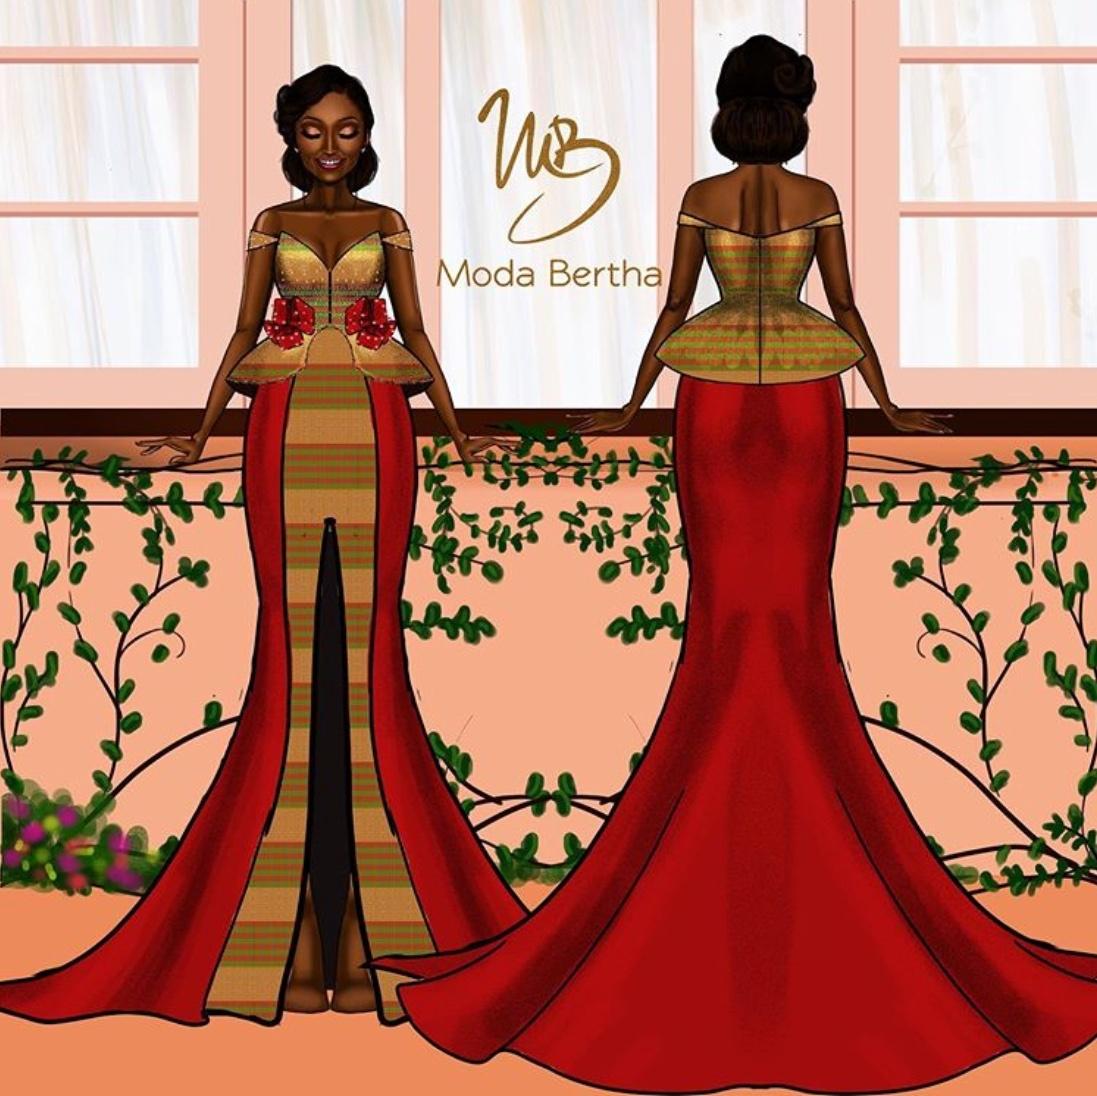 moda bertha dress sketch